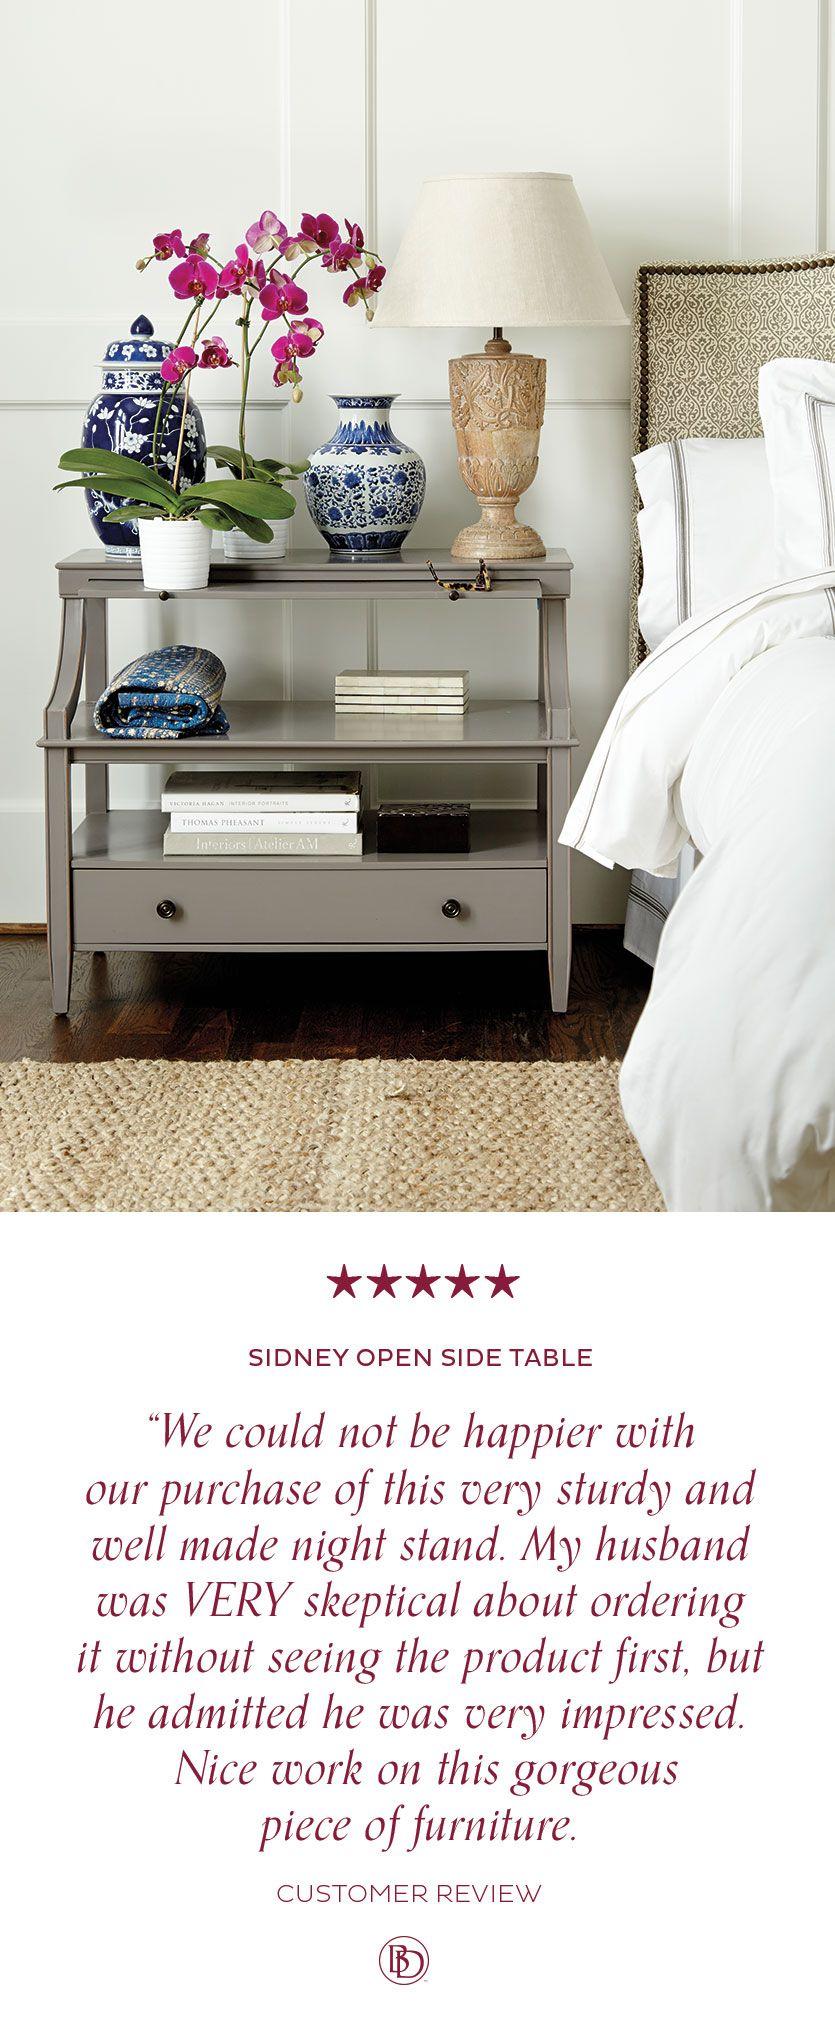 sidney open side table | bedroom | table, bedroom, bedroom decor